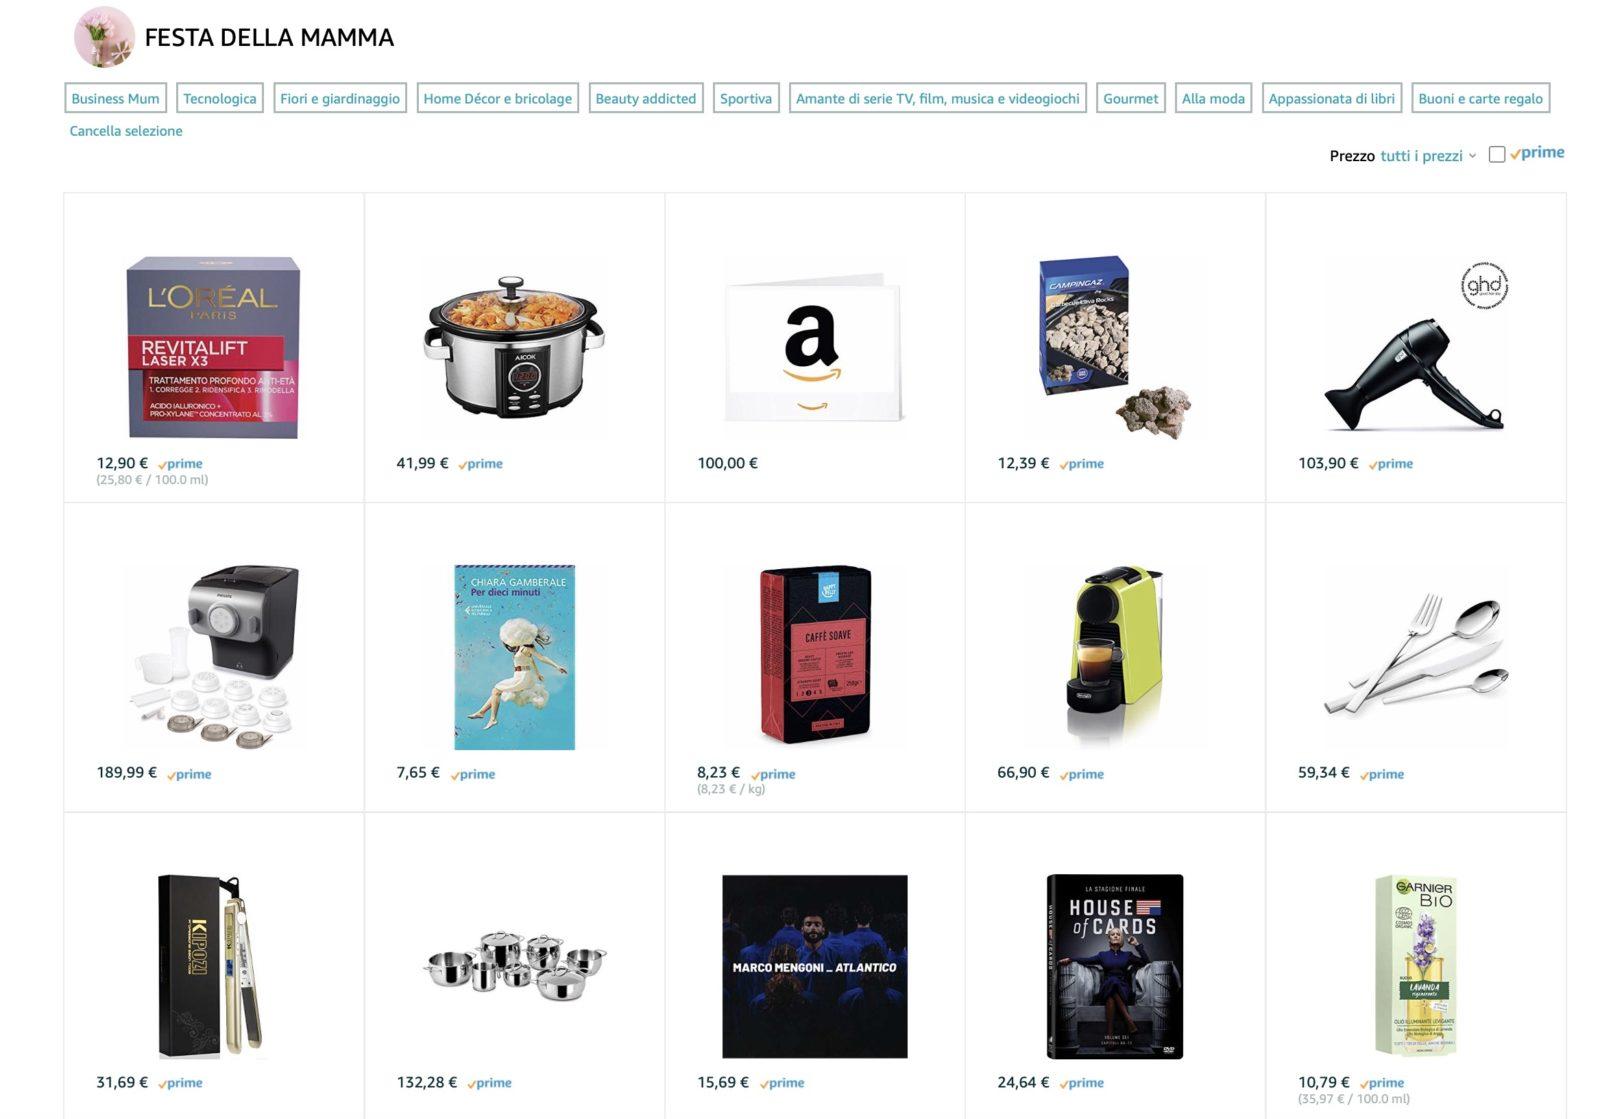 Sconti Amazon con Philips Hue, iRobot, Huawei, Nilox, Acer, Ring